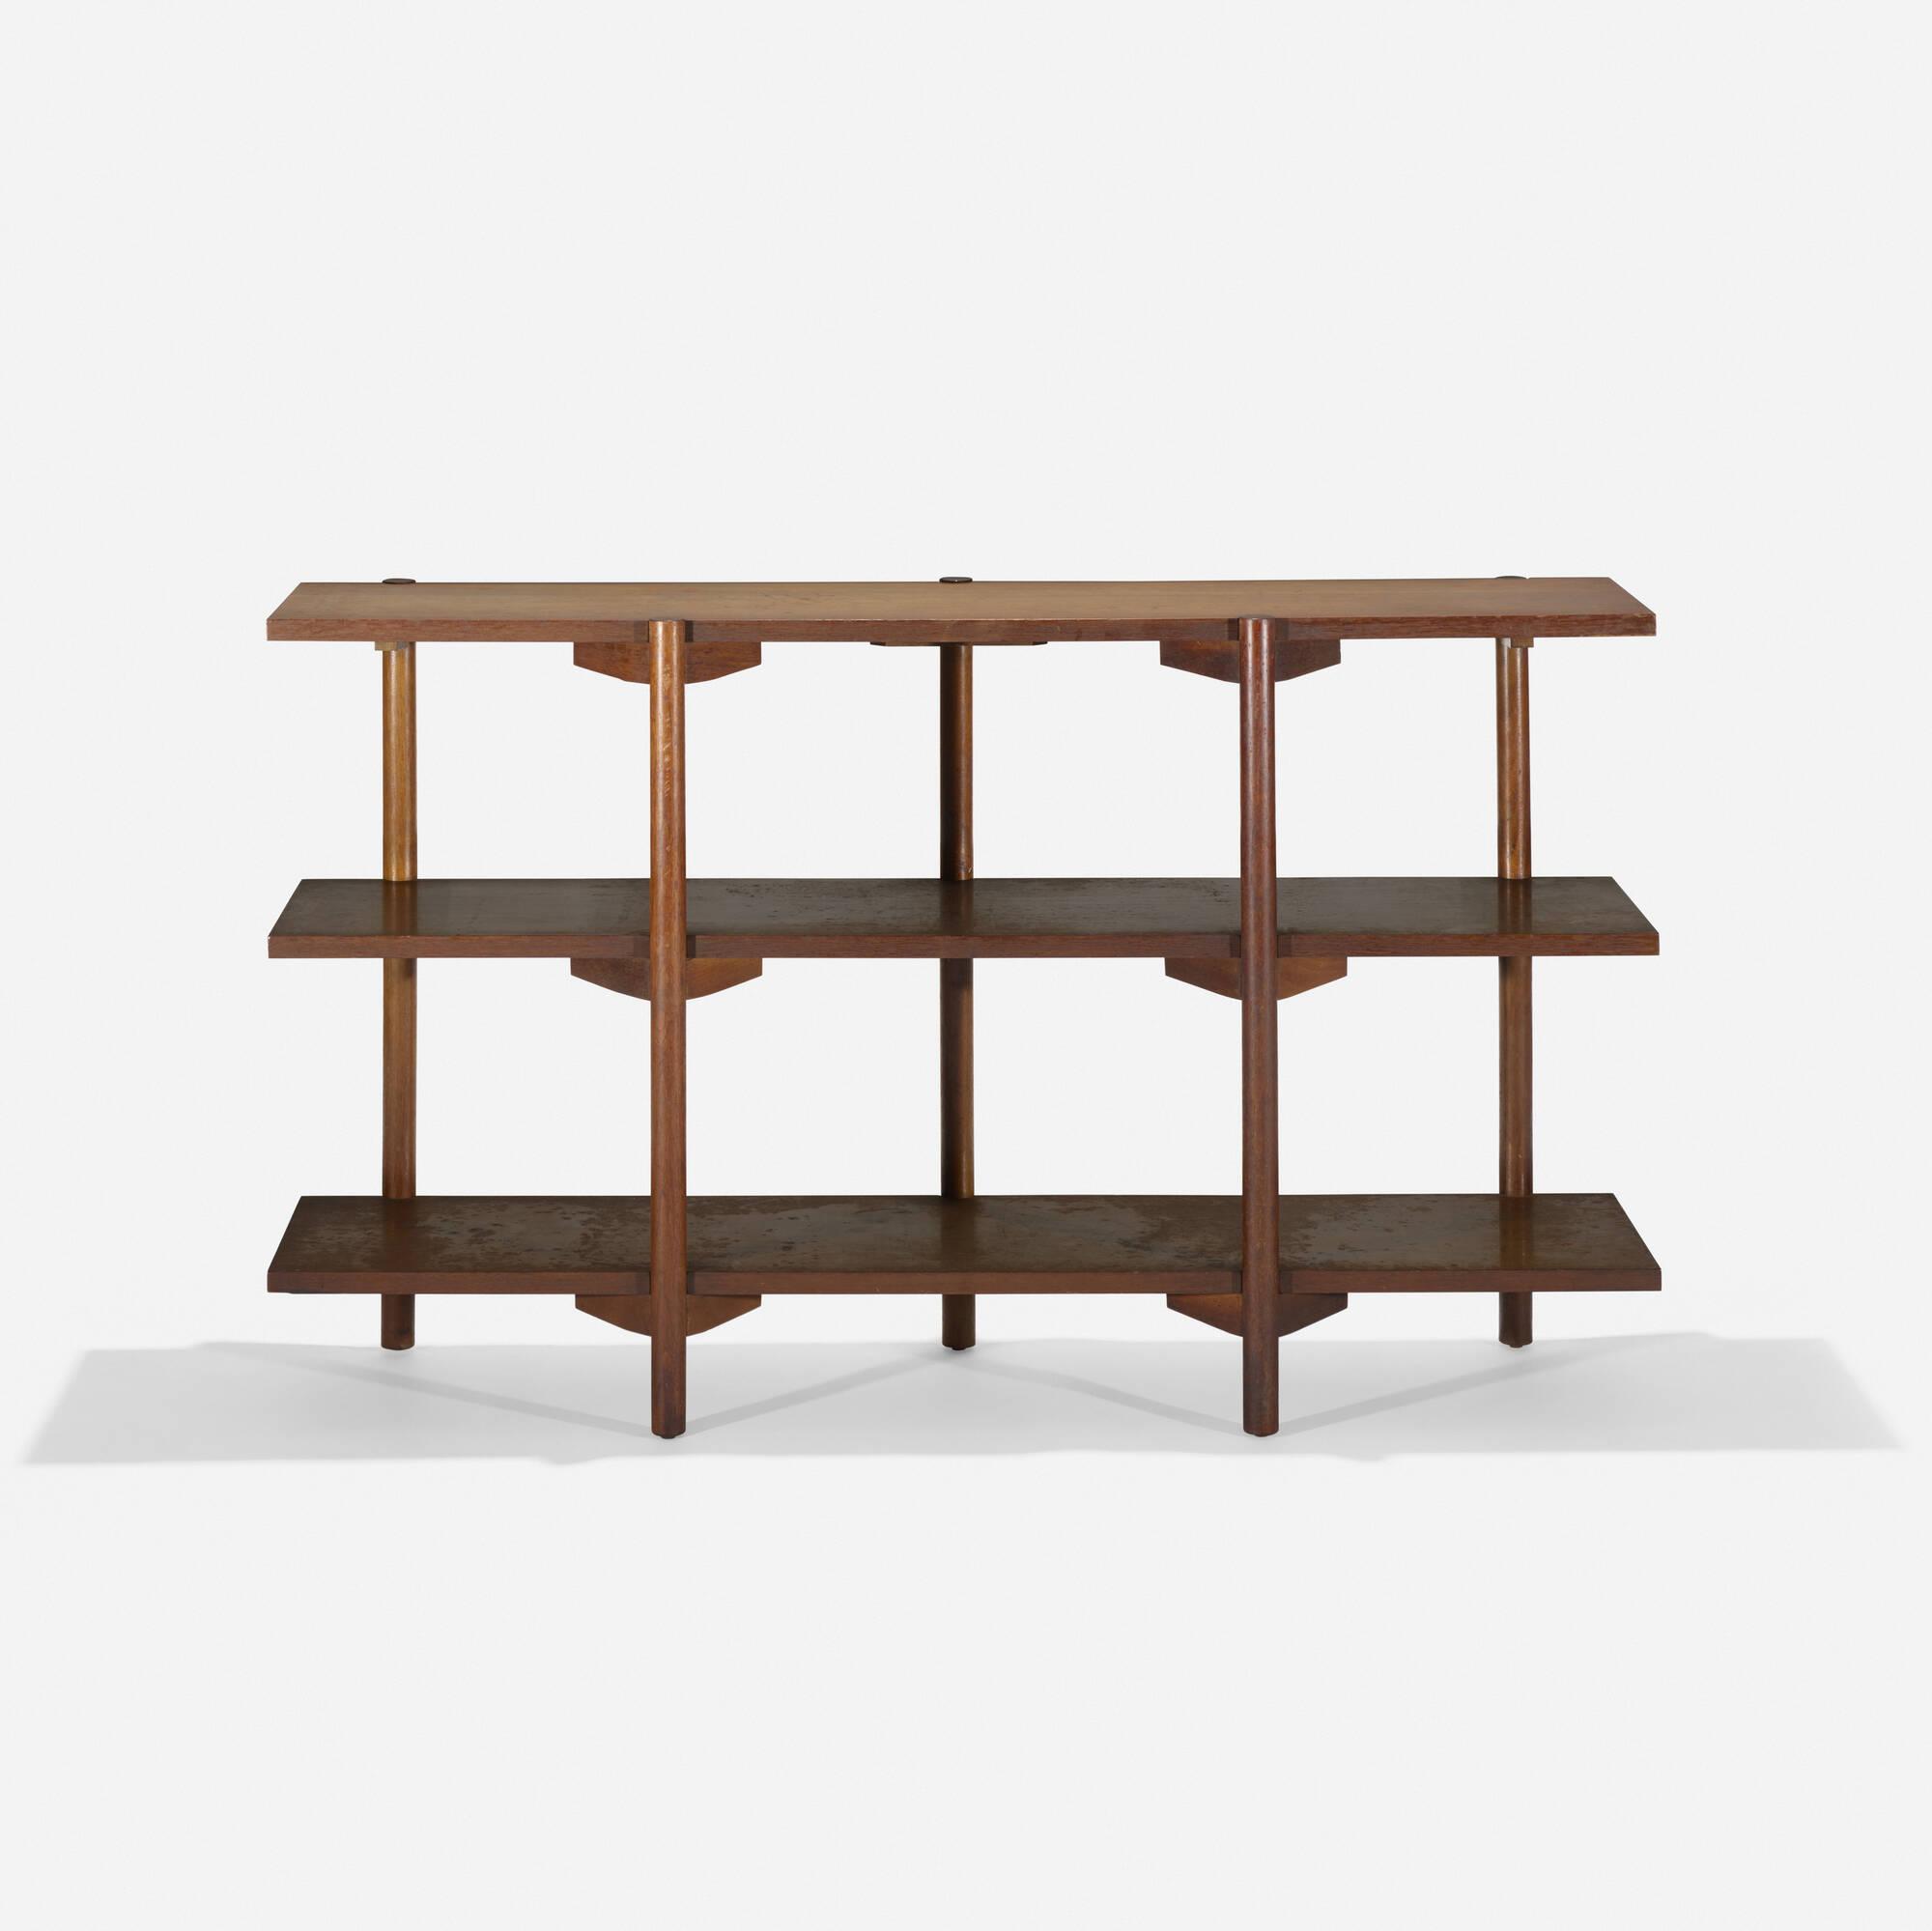 114: Milo Baughman / bookshelf (1 of 2)